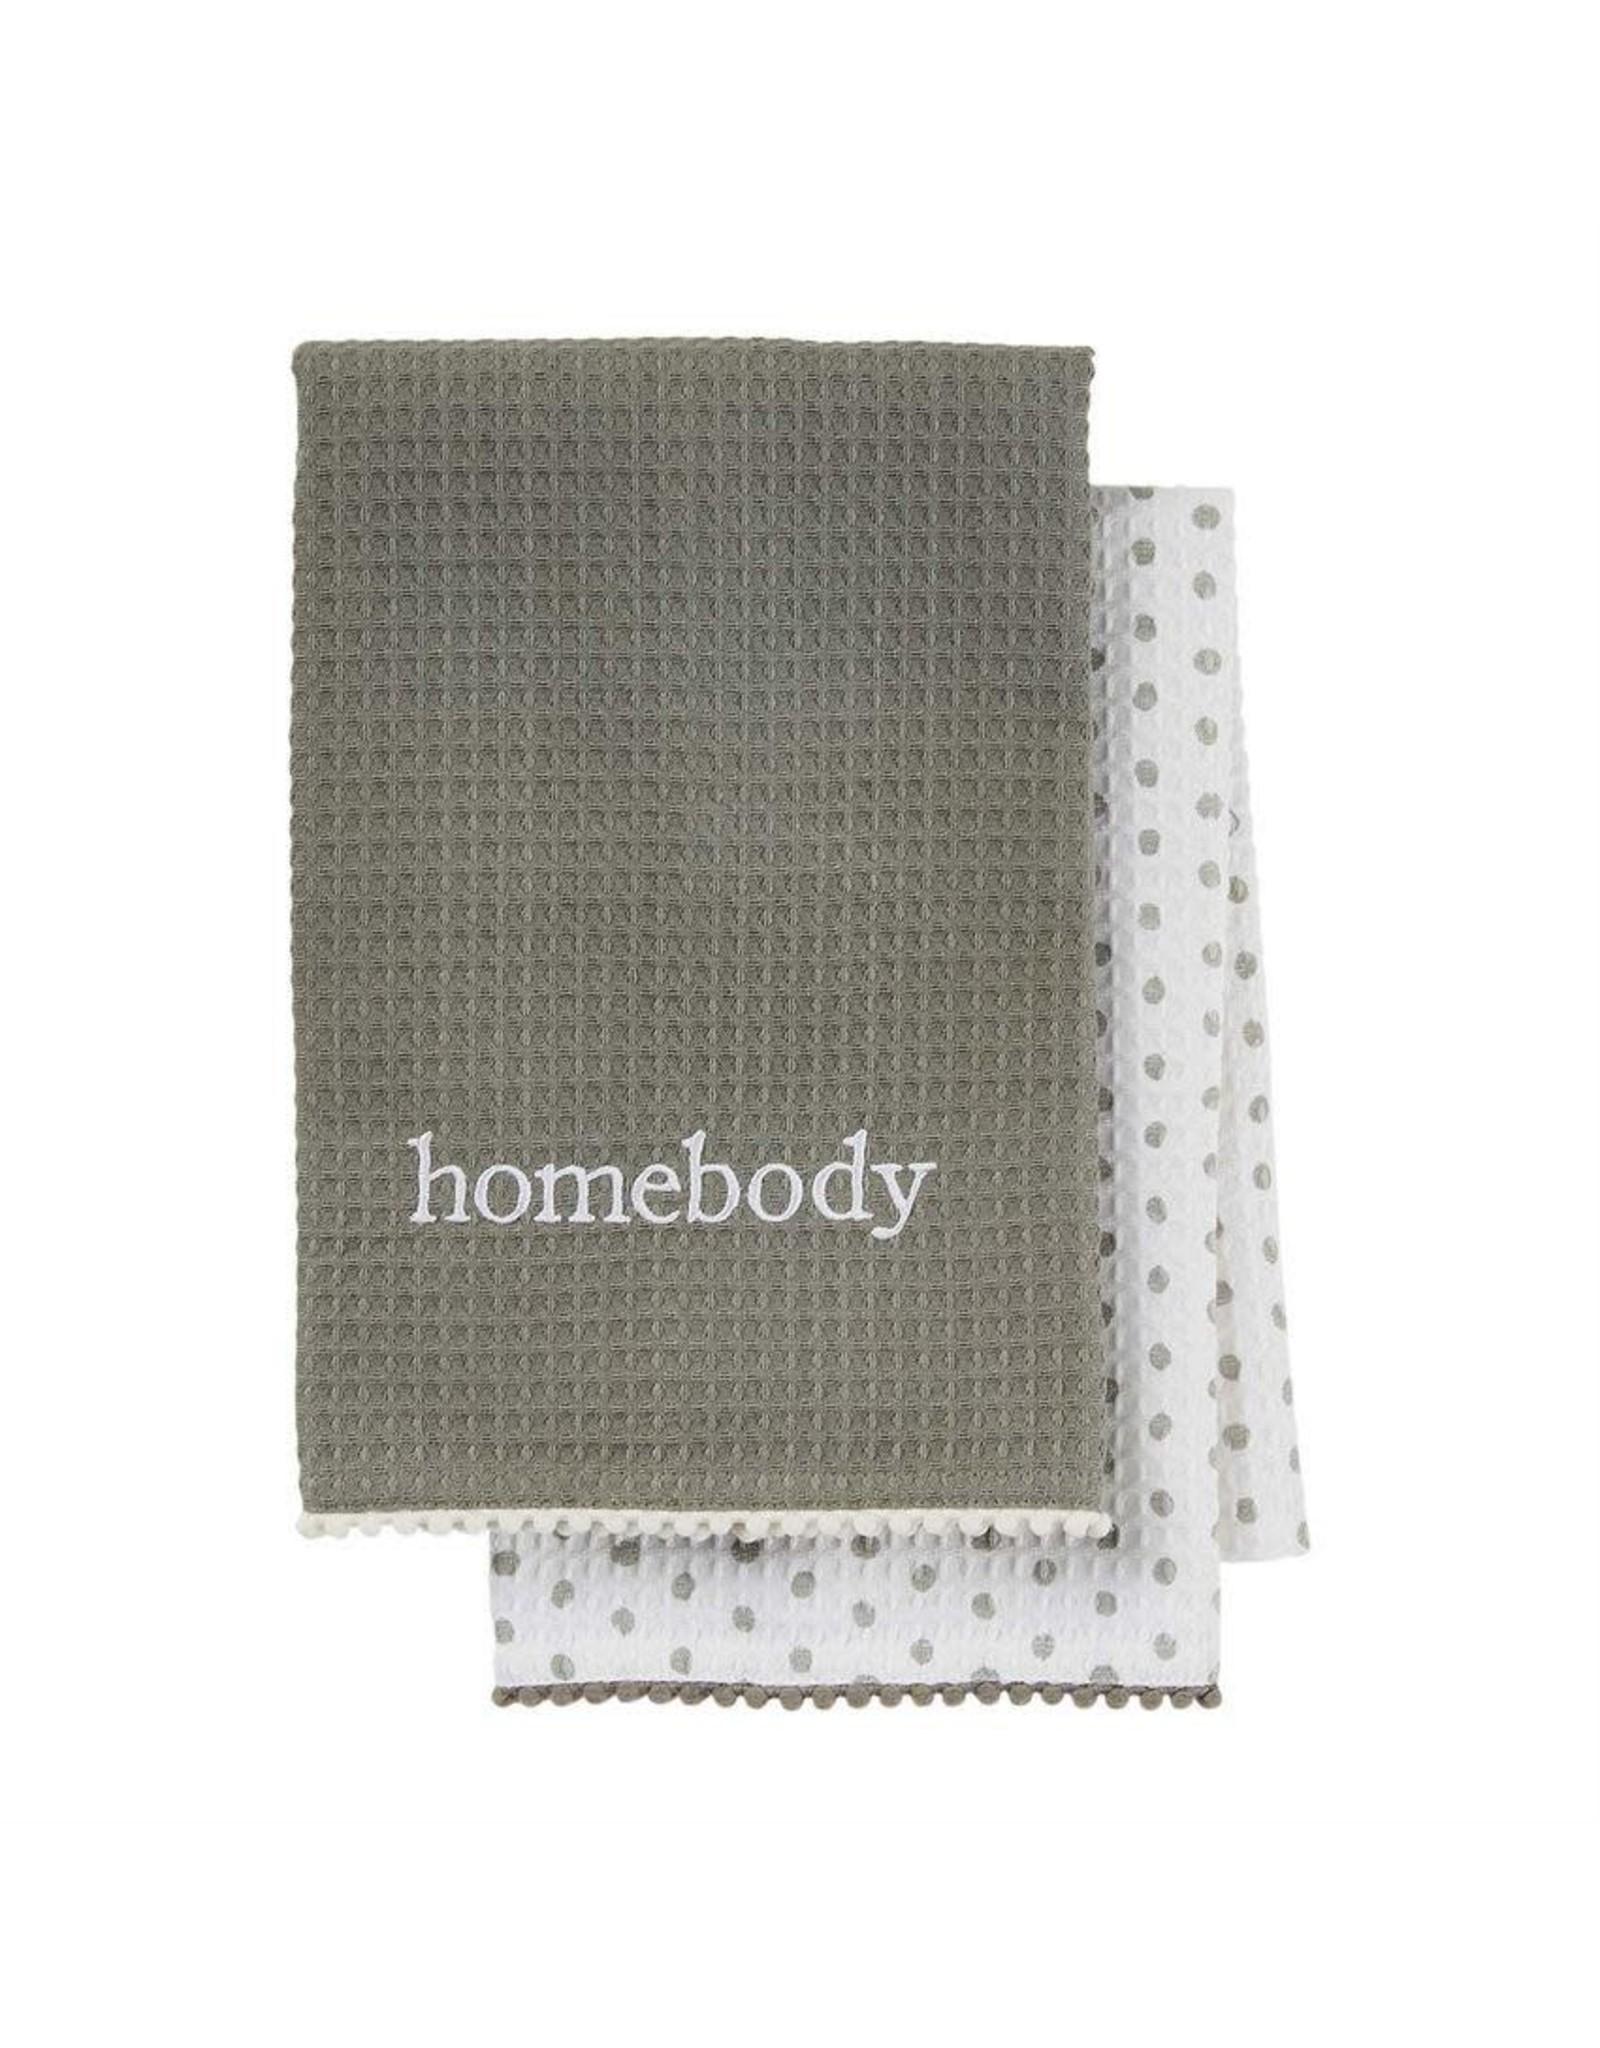 Homebody Waffle towel set